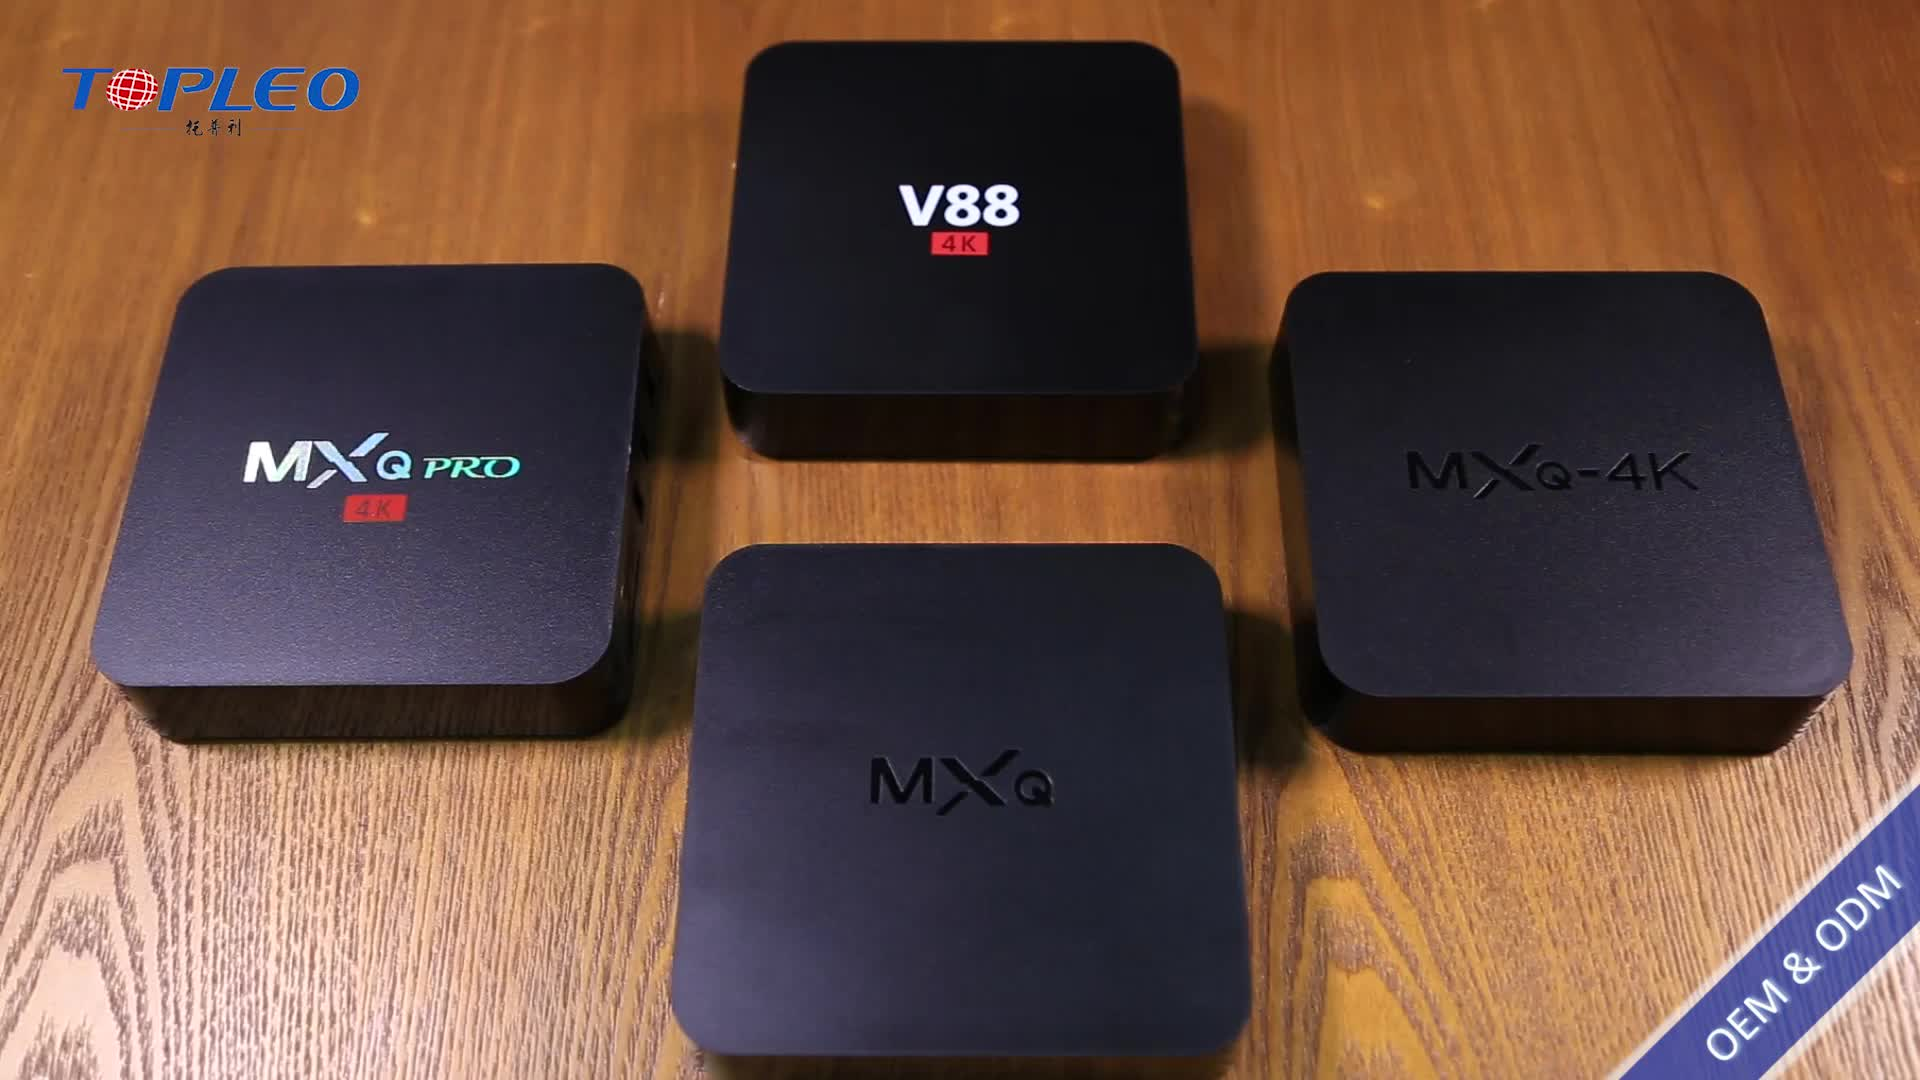 लागत-प्रभावी अनुकूलित सॉफ्टवेयर डाउनलोड एंड्रॉयड स्मार्ट इंटरनेट टीवी ई डिजिटल हवा करने के लिए स्वतंत्र केबल सेट टॉप बॉक्स